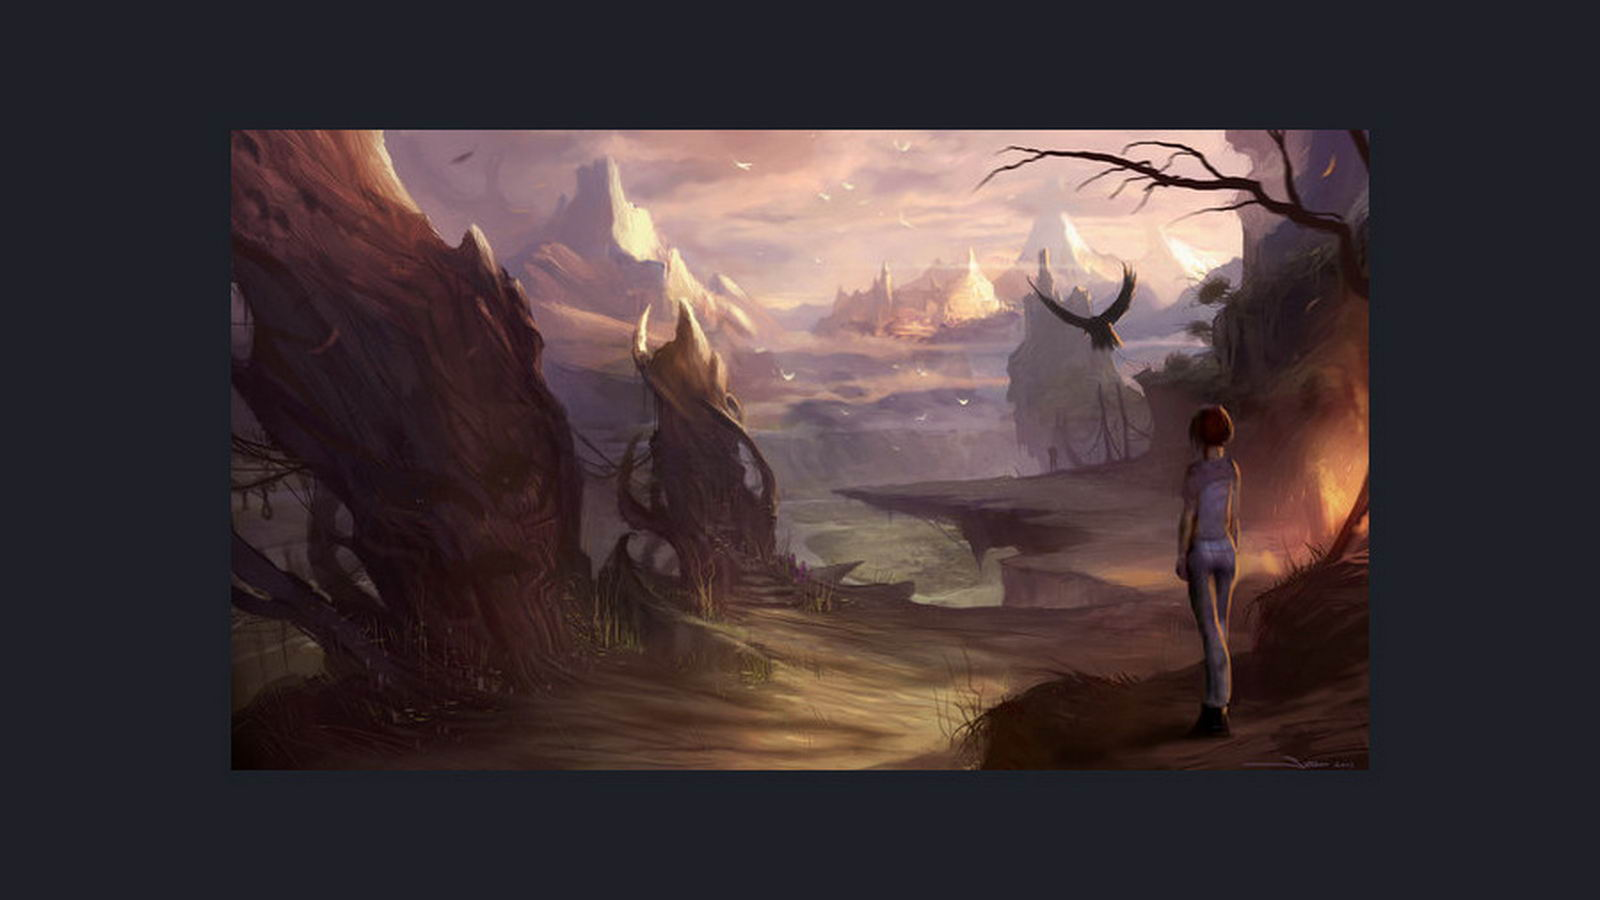 Арт Dreamfall Chapters: Book One - Reborn